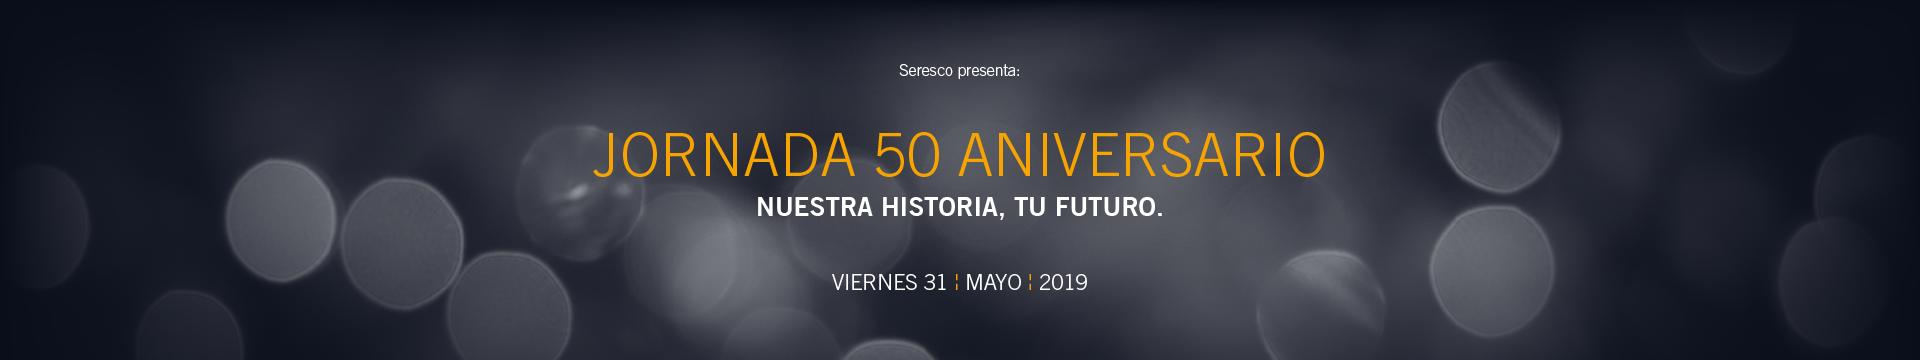 Jornada 50 Aniversario Seresco